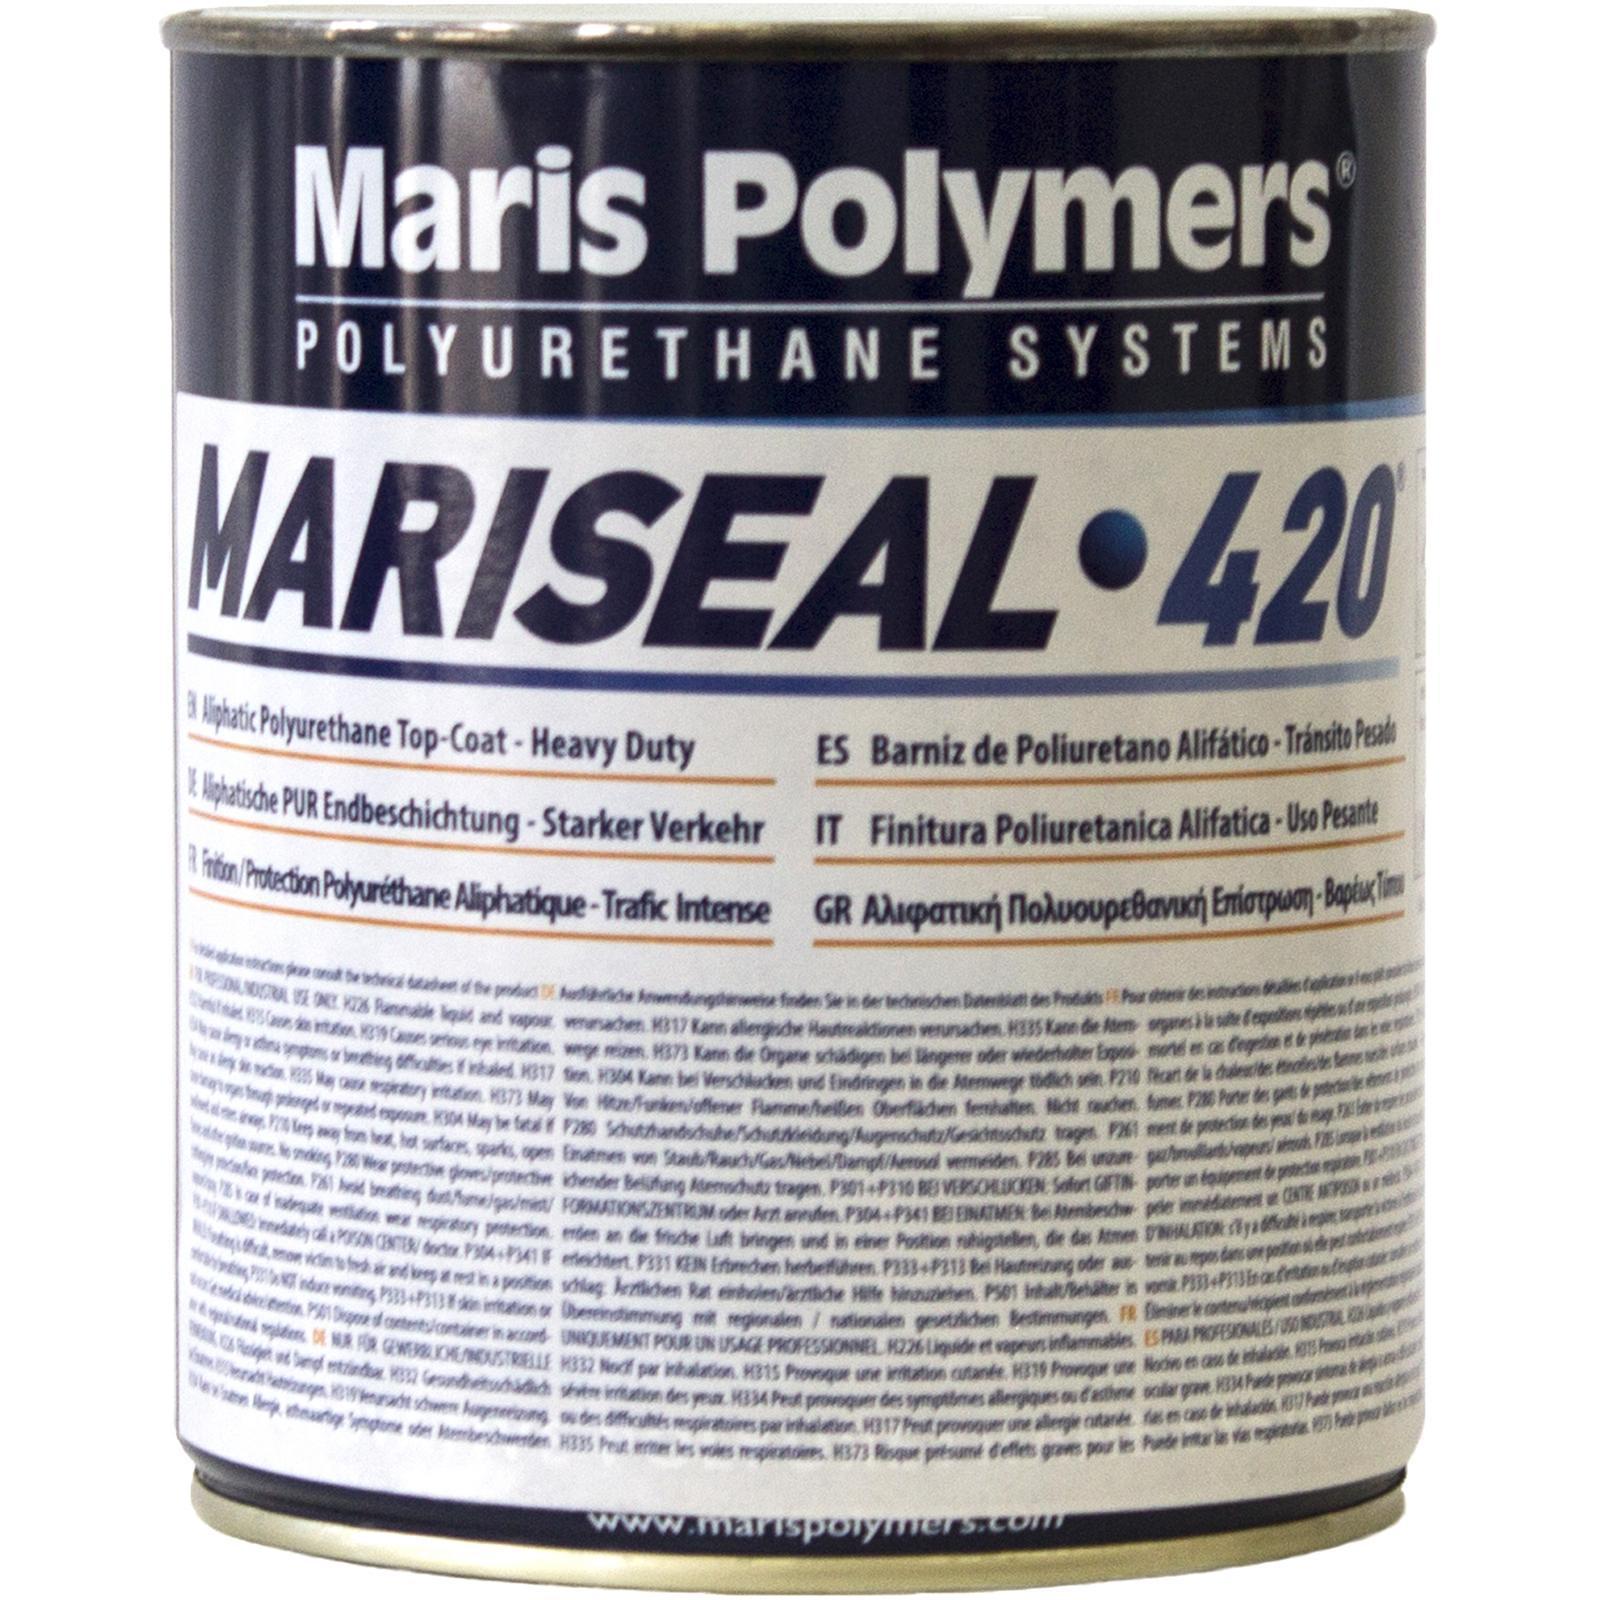 MARISEAL® 420